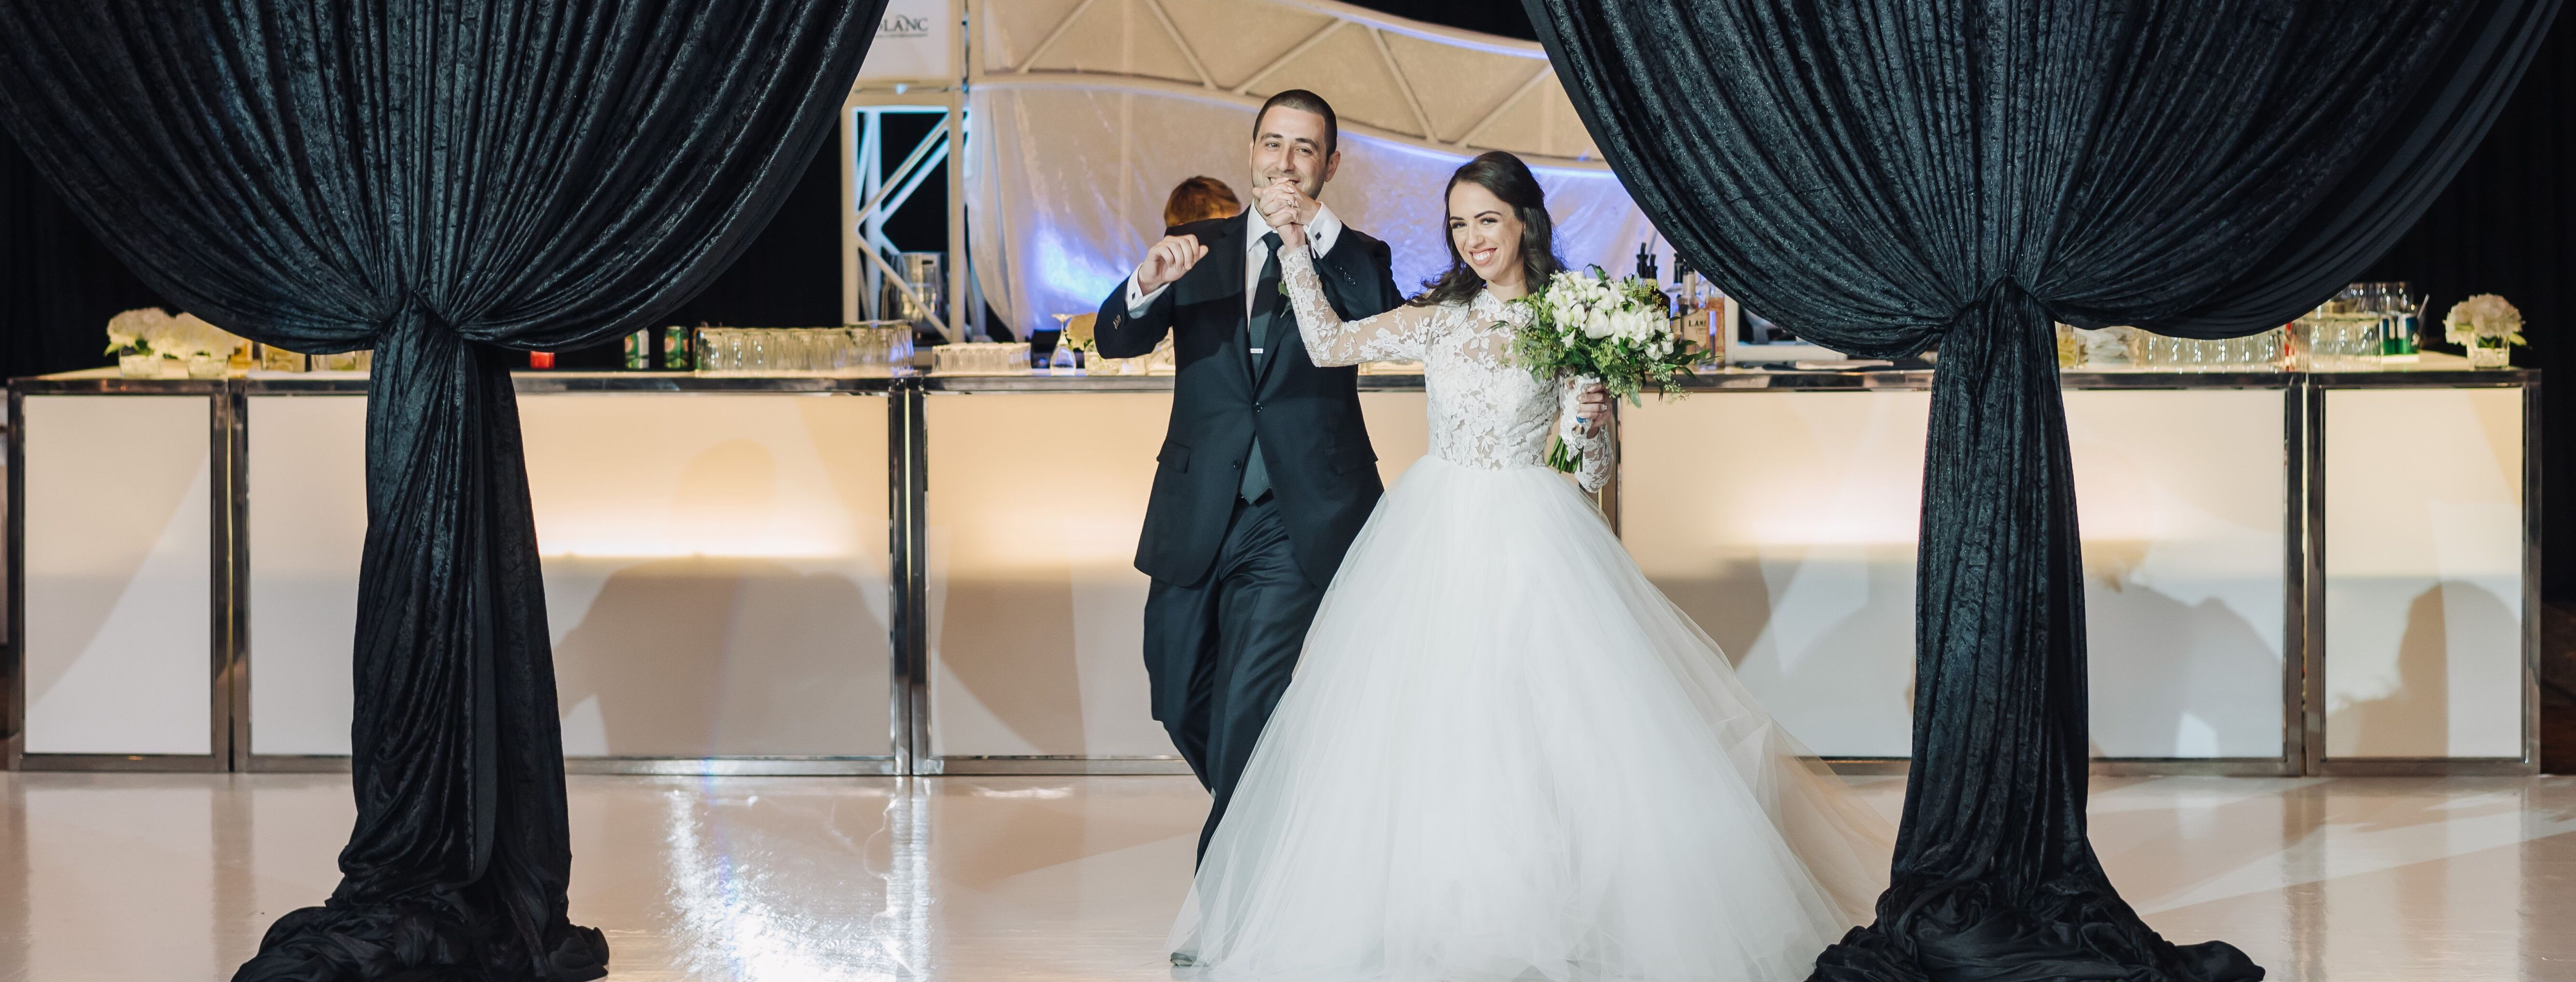 MCC Megan and Joshua Wedding Oct 2018 - Focus Photography 15